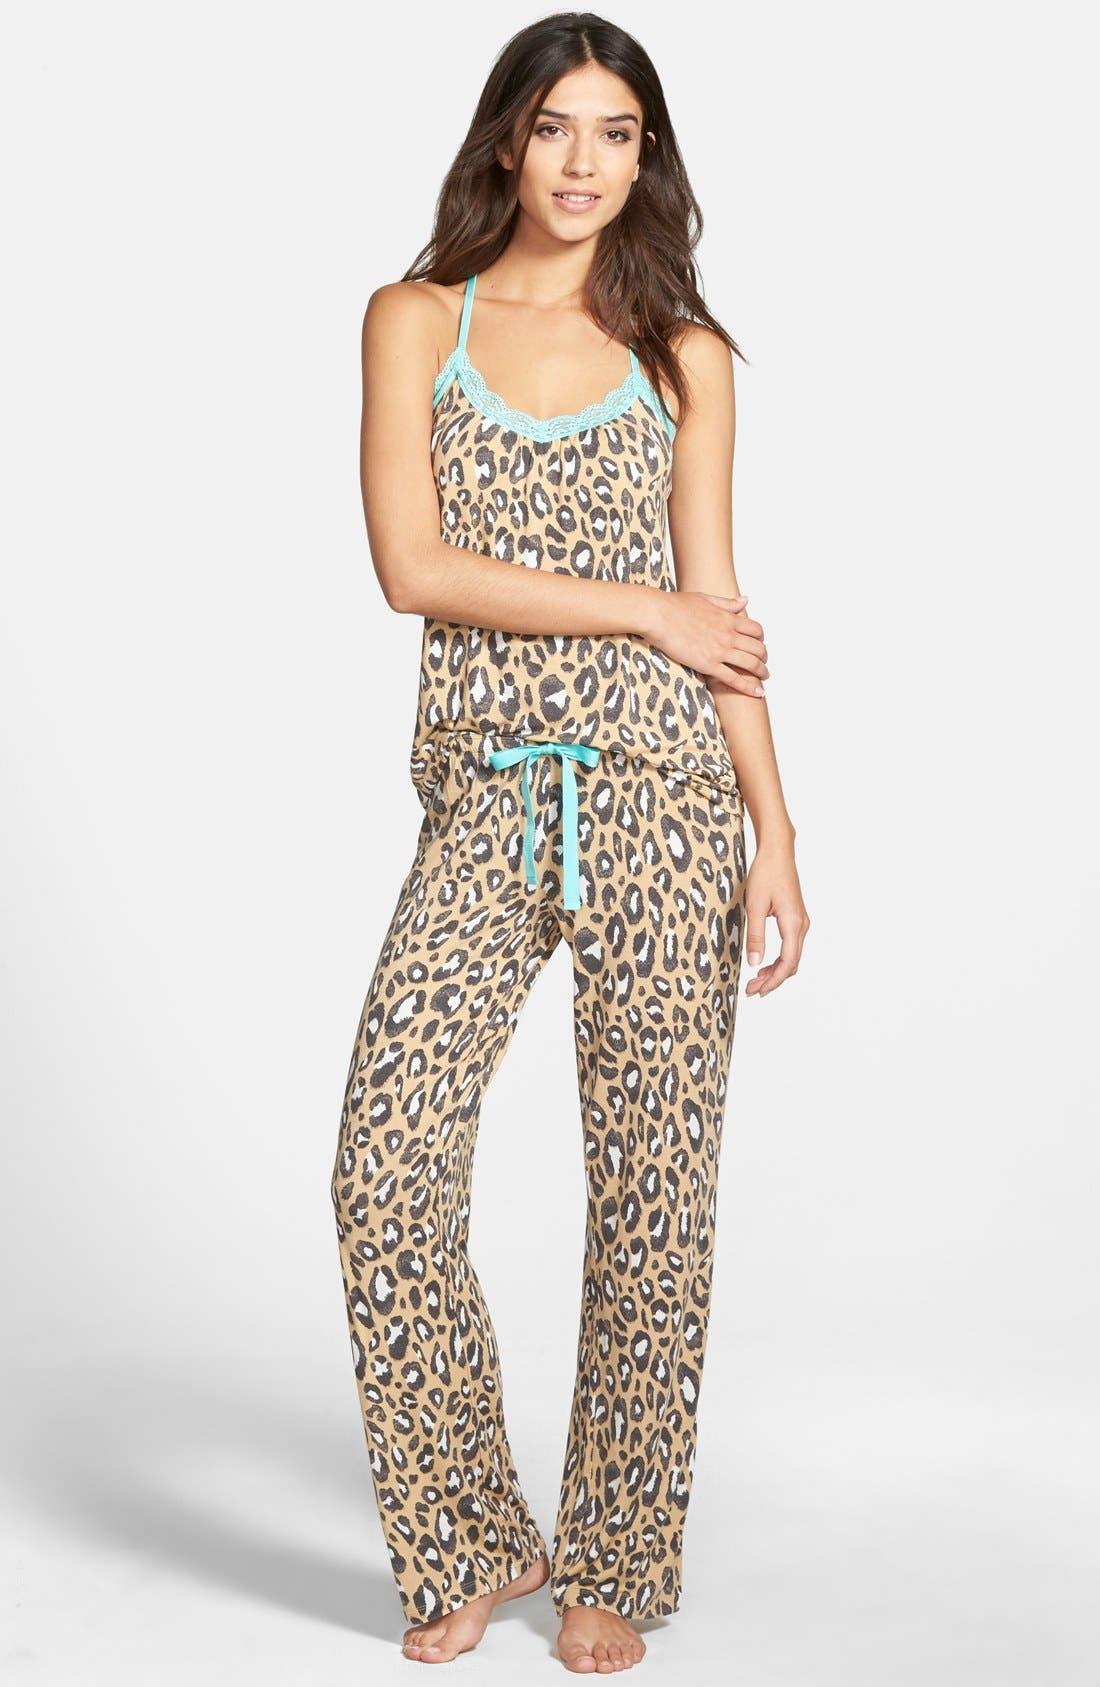 Alternate Image 1 Selected - PJ Salvage Lace Trim Print Jersey Pajamas (Nordstrom Exclusive)